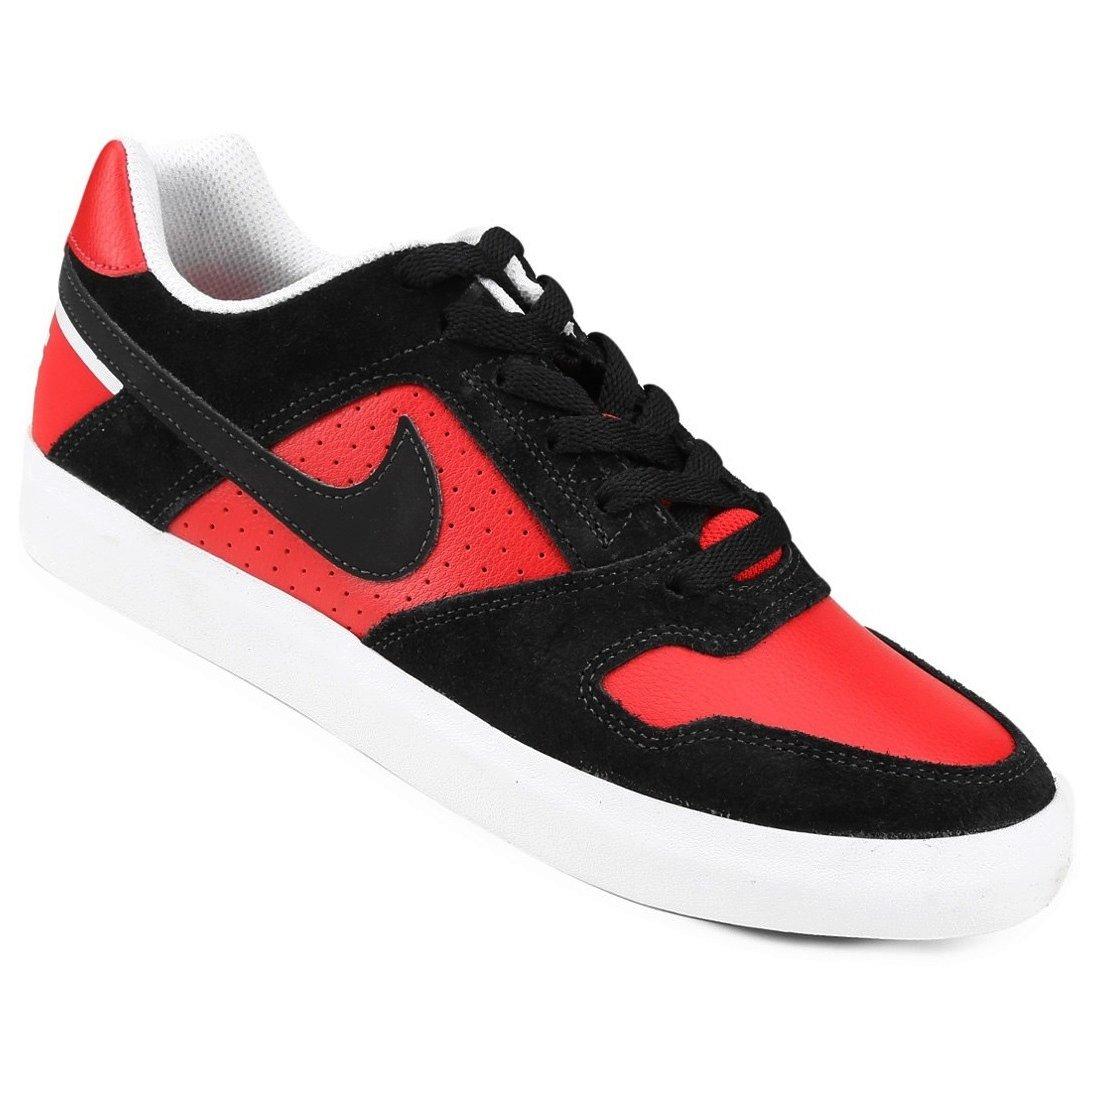 d1c20a9f044 Tênis Masculino Nike SB Delta Force Vulc 942237-006 - Preto Vermelho ...